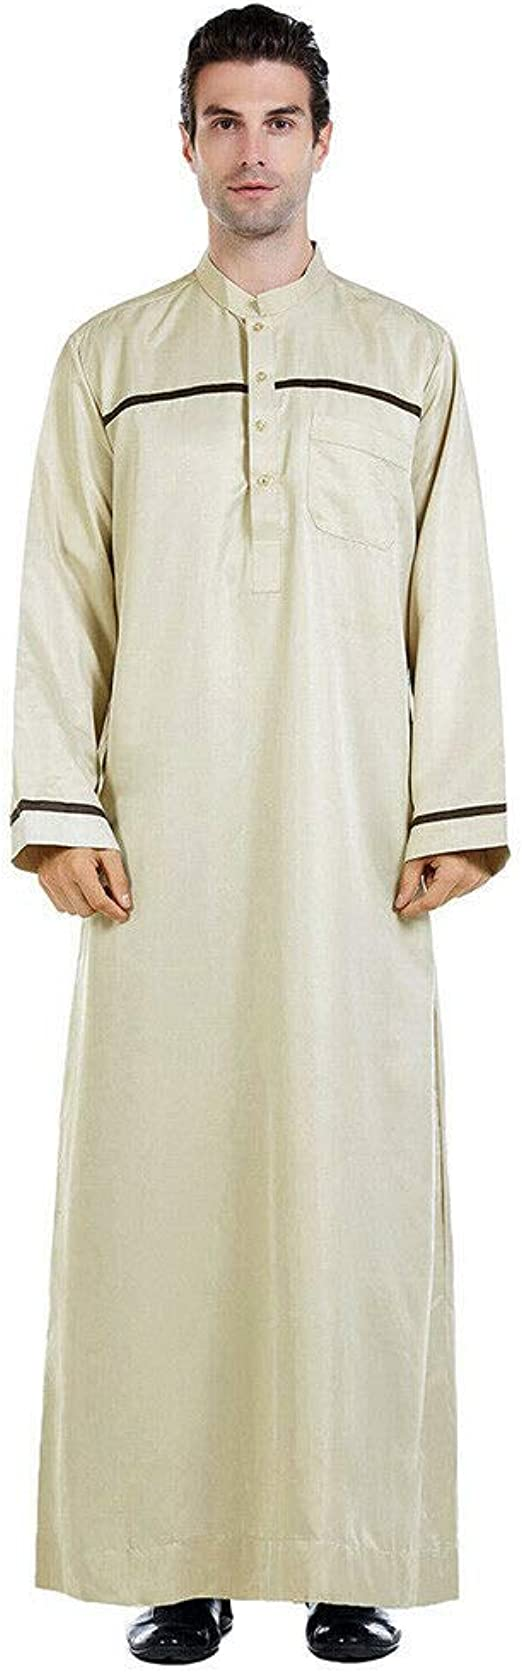 Mens Islamic Abaya Jubba Kaftan Long Sleeve Casual Ethnic Long Kaftan Thobe Robe